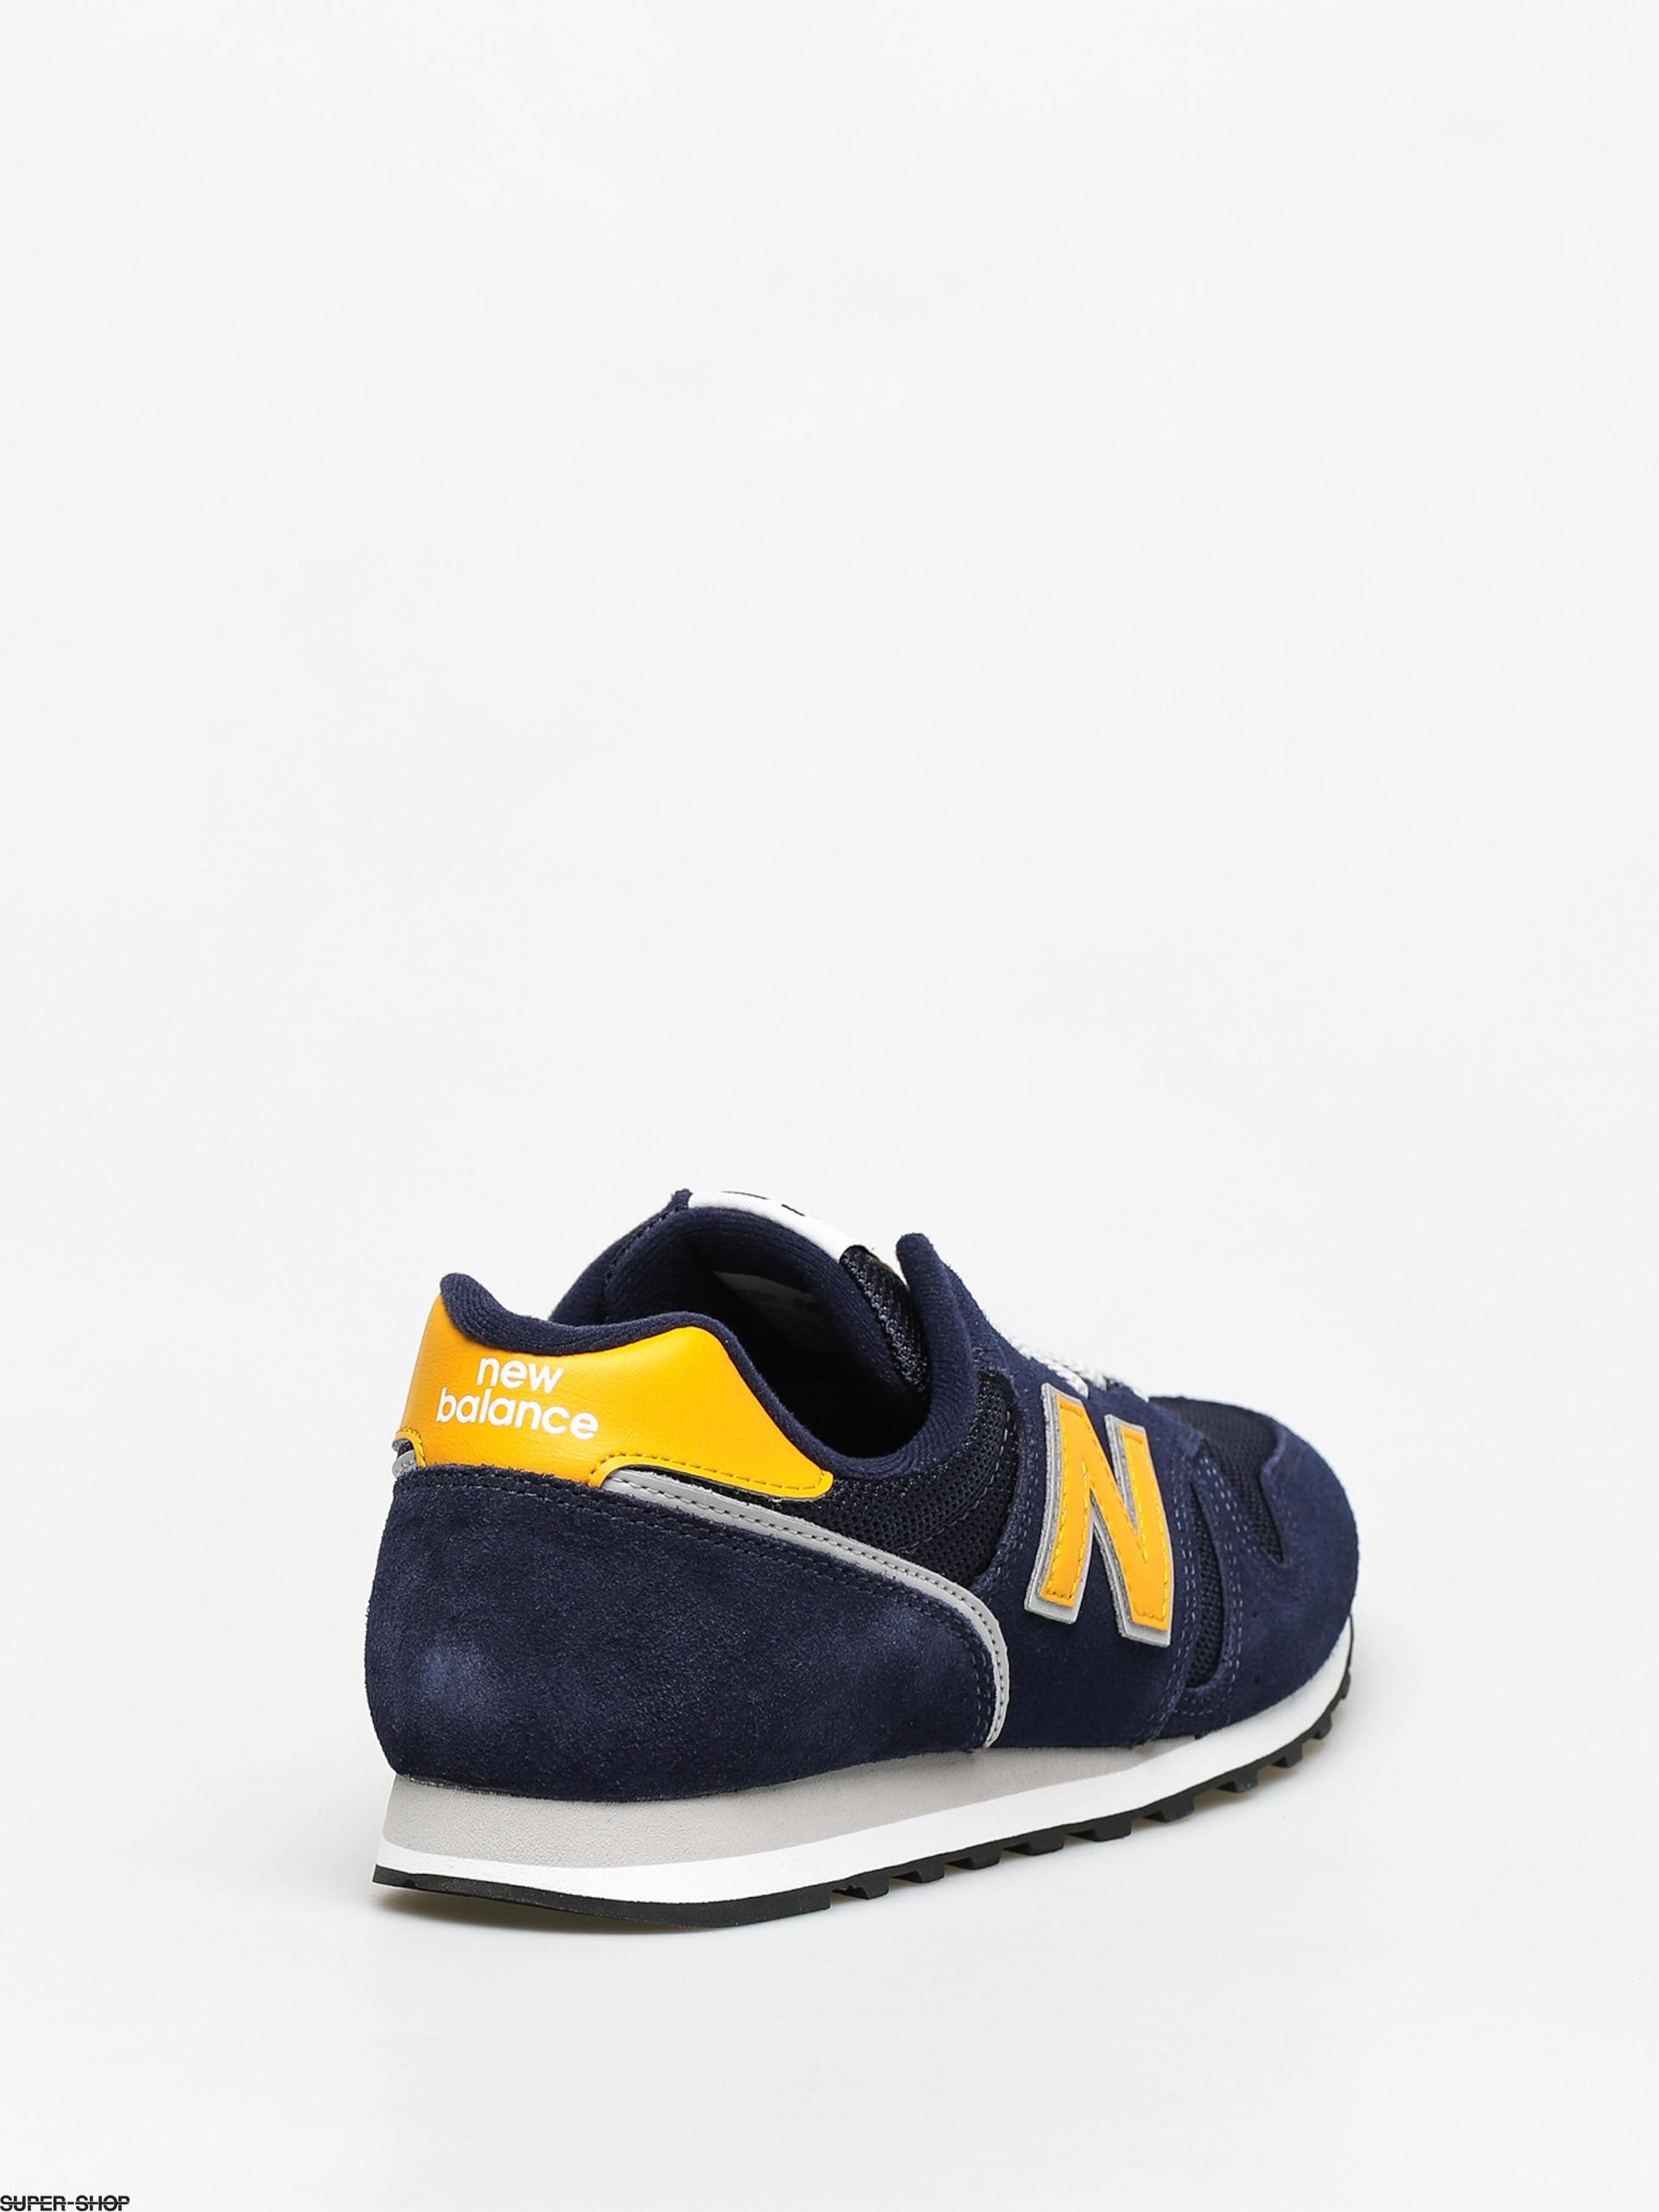 new balance 373 navy grey